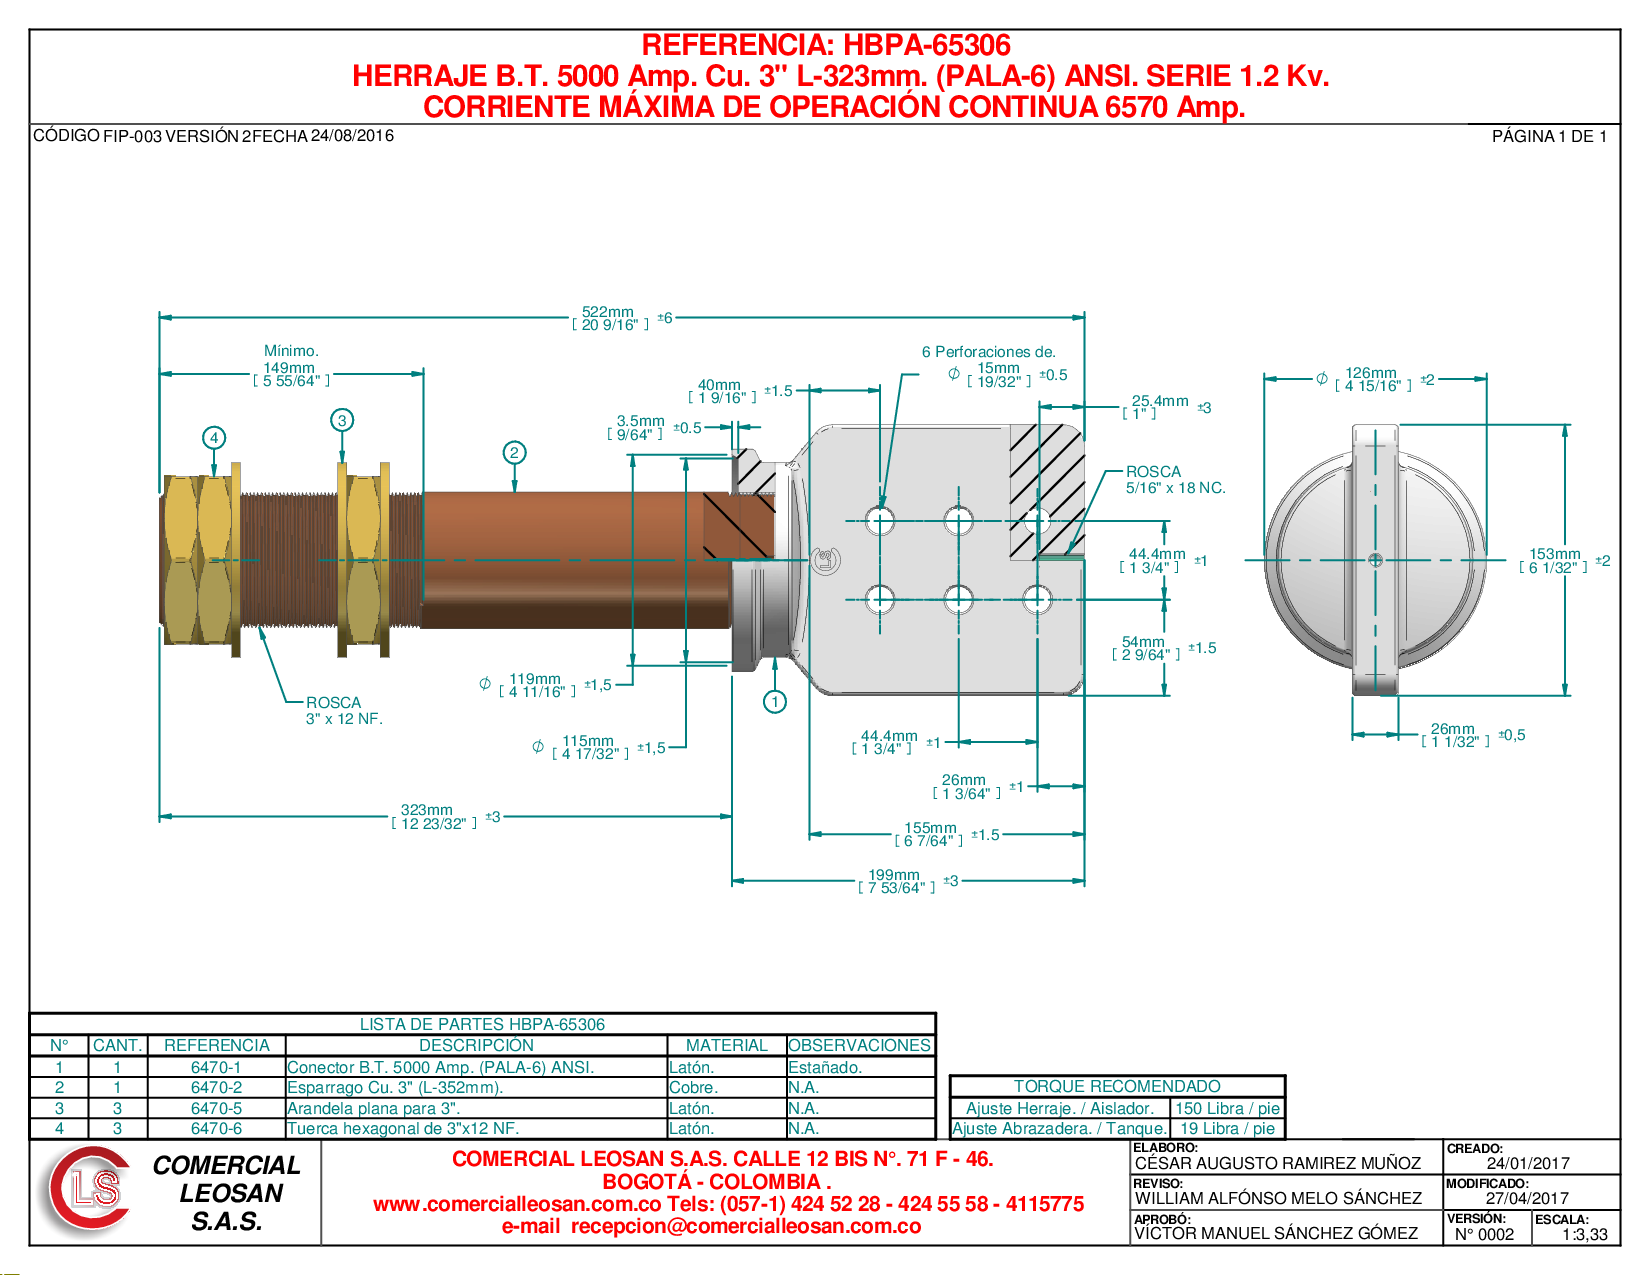 "HERRAJE B.T. 5000 Amp. Cu. 3"" L-323mm. (PALA-6) ANSI. SERIE 1.2 Kv."